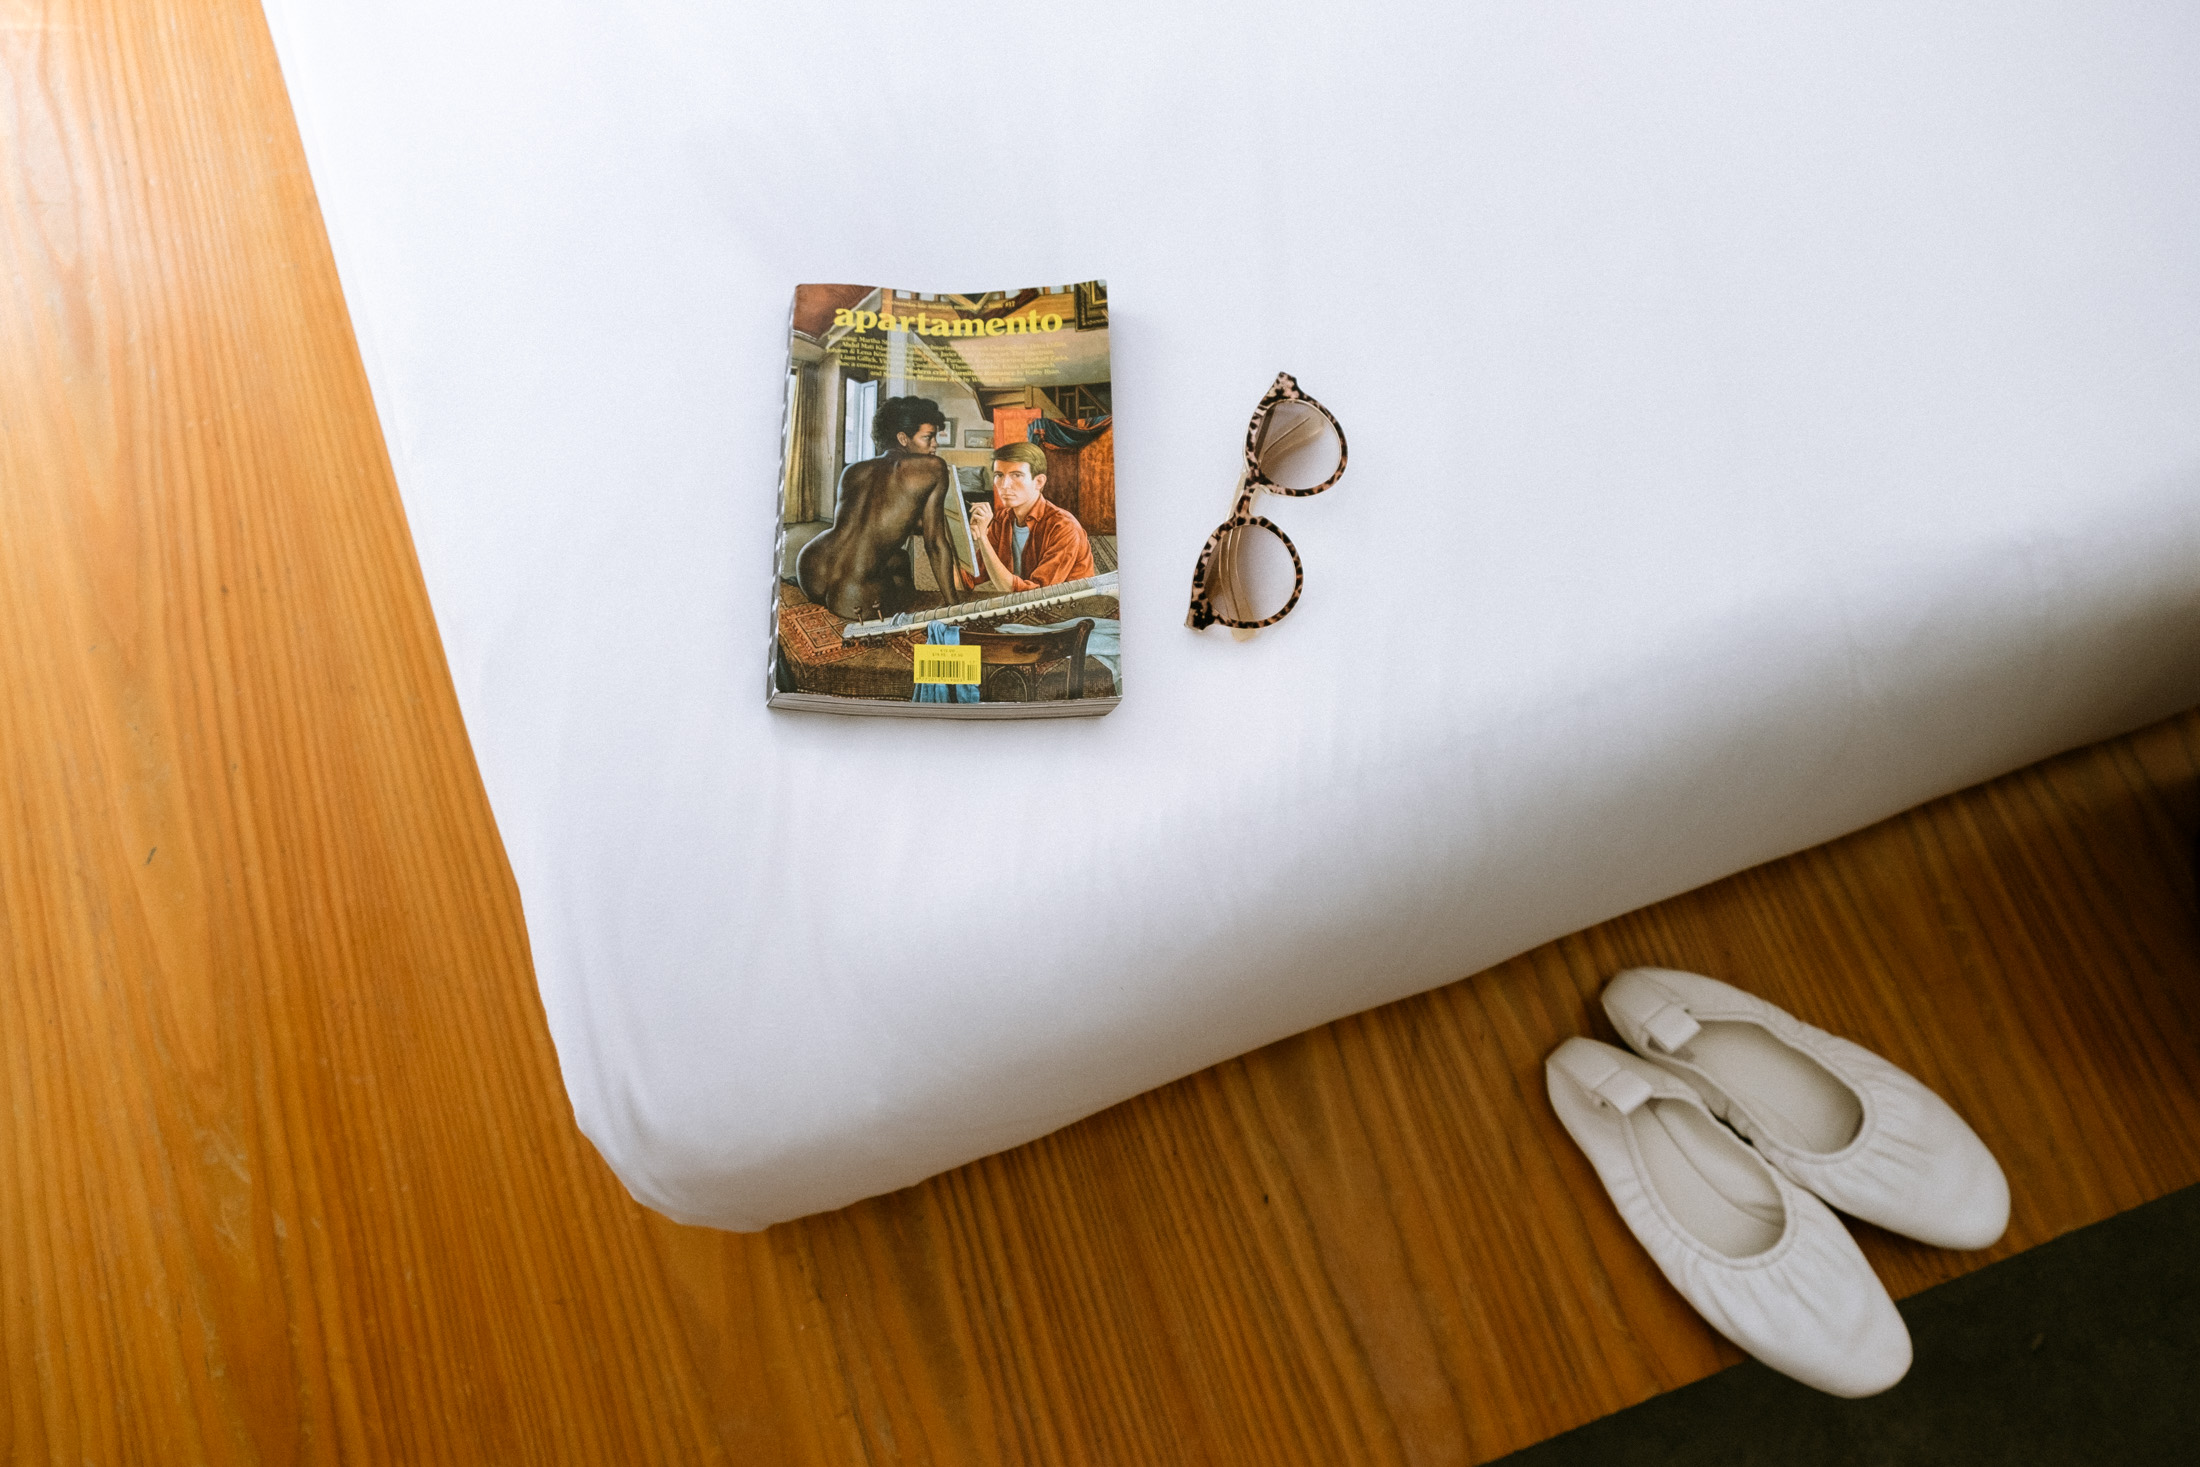 hotel-americano-4.jpg